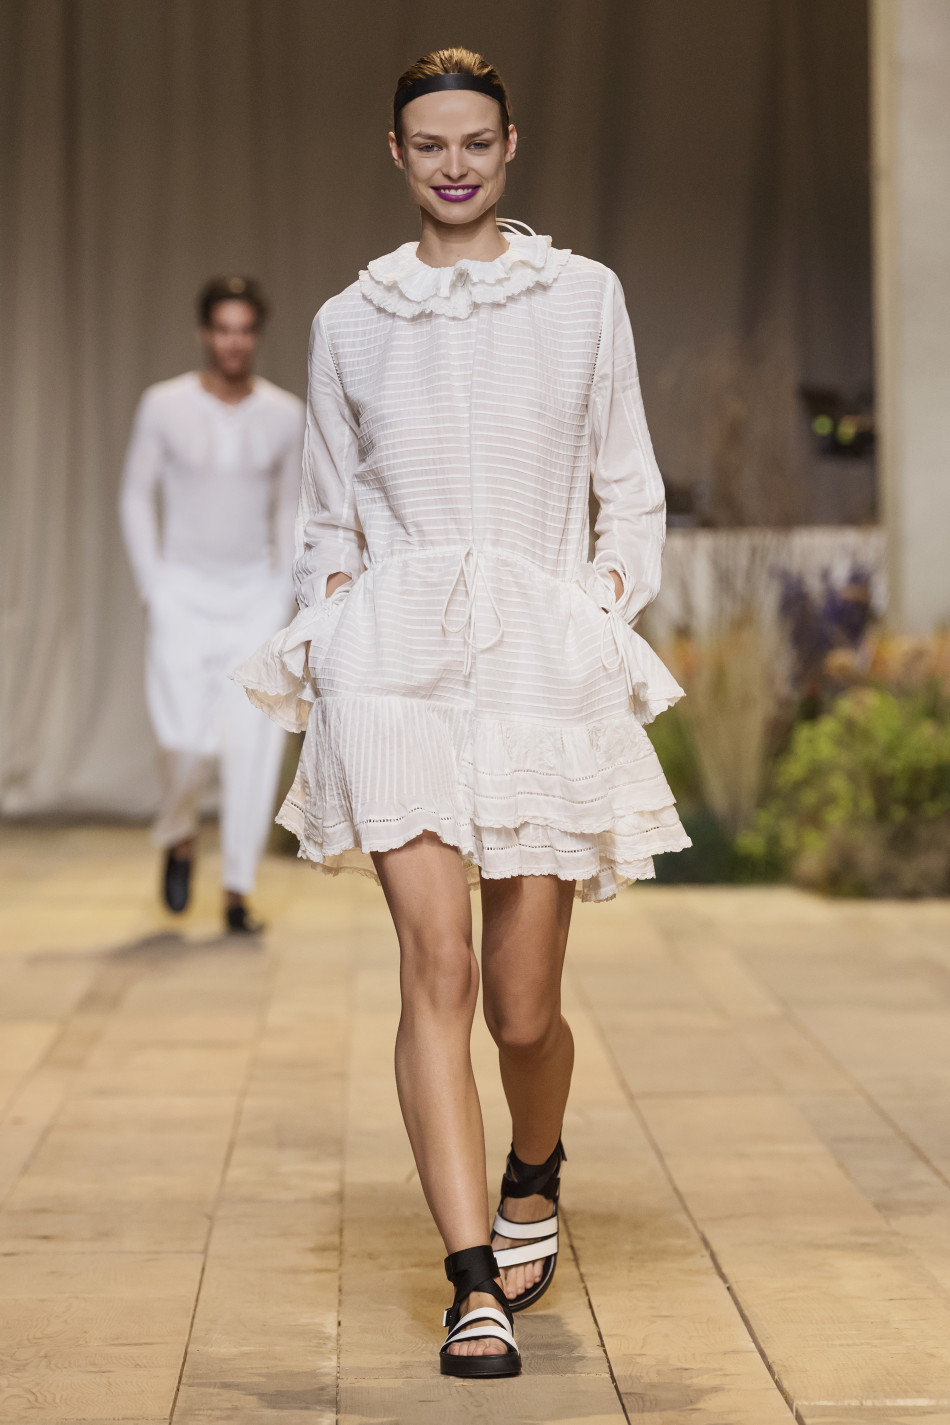 M: EVO-WATS : Home Improvement Wats in fashion now